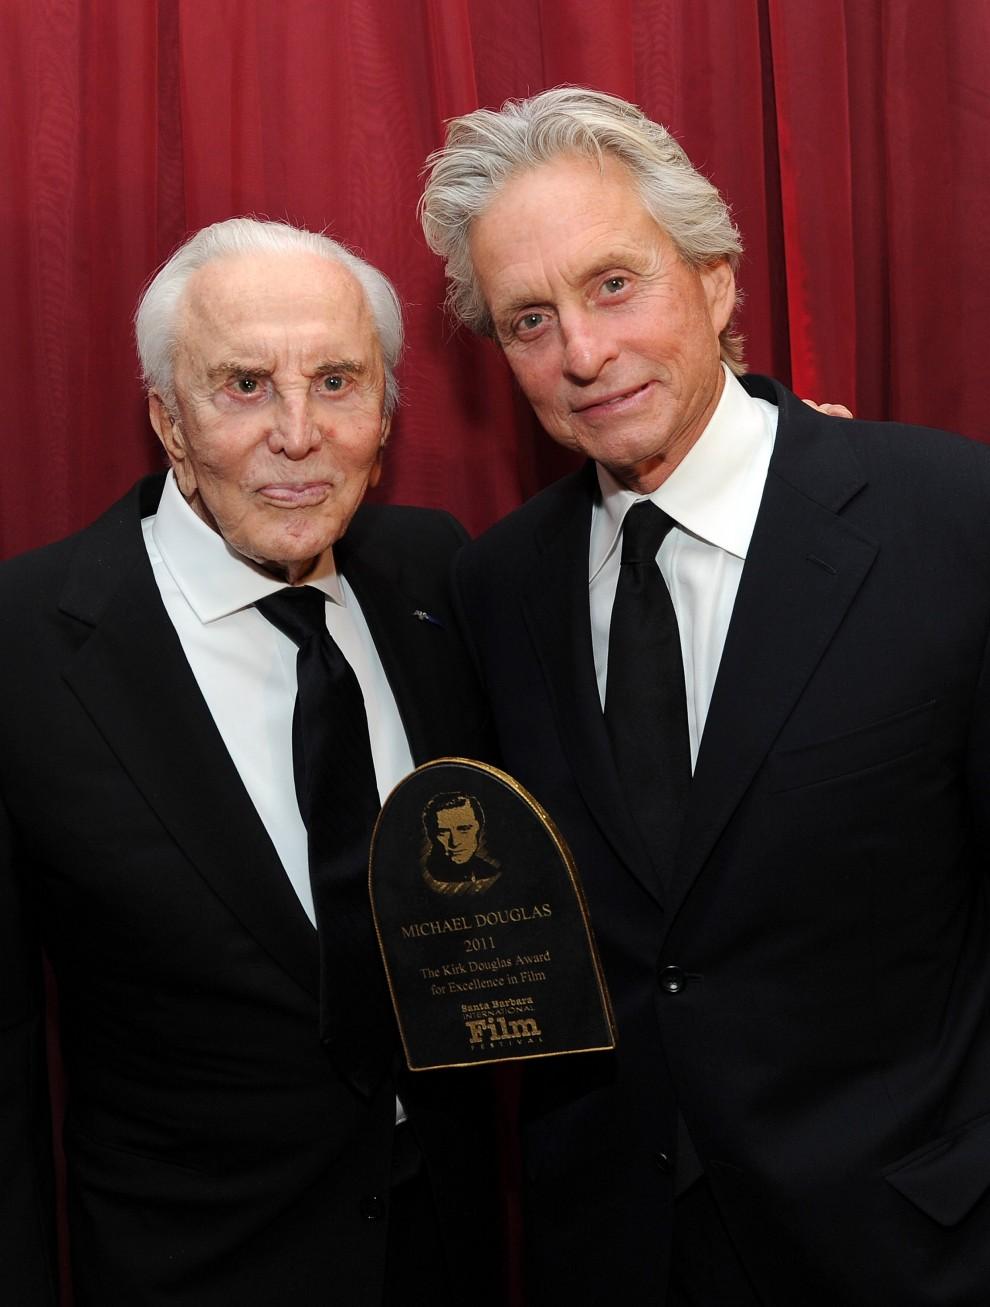 Kirk Douglas Award For Excellence In Film